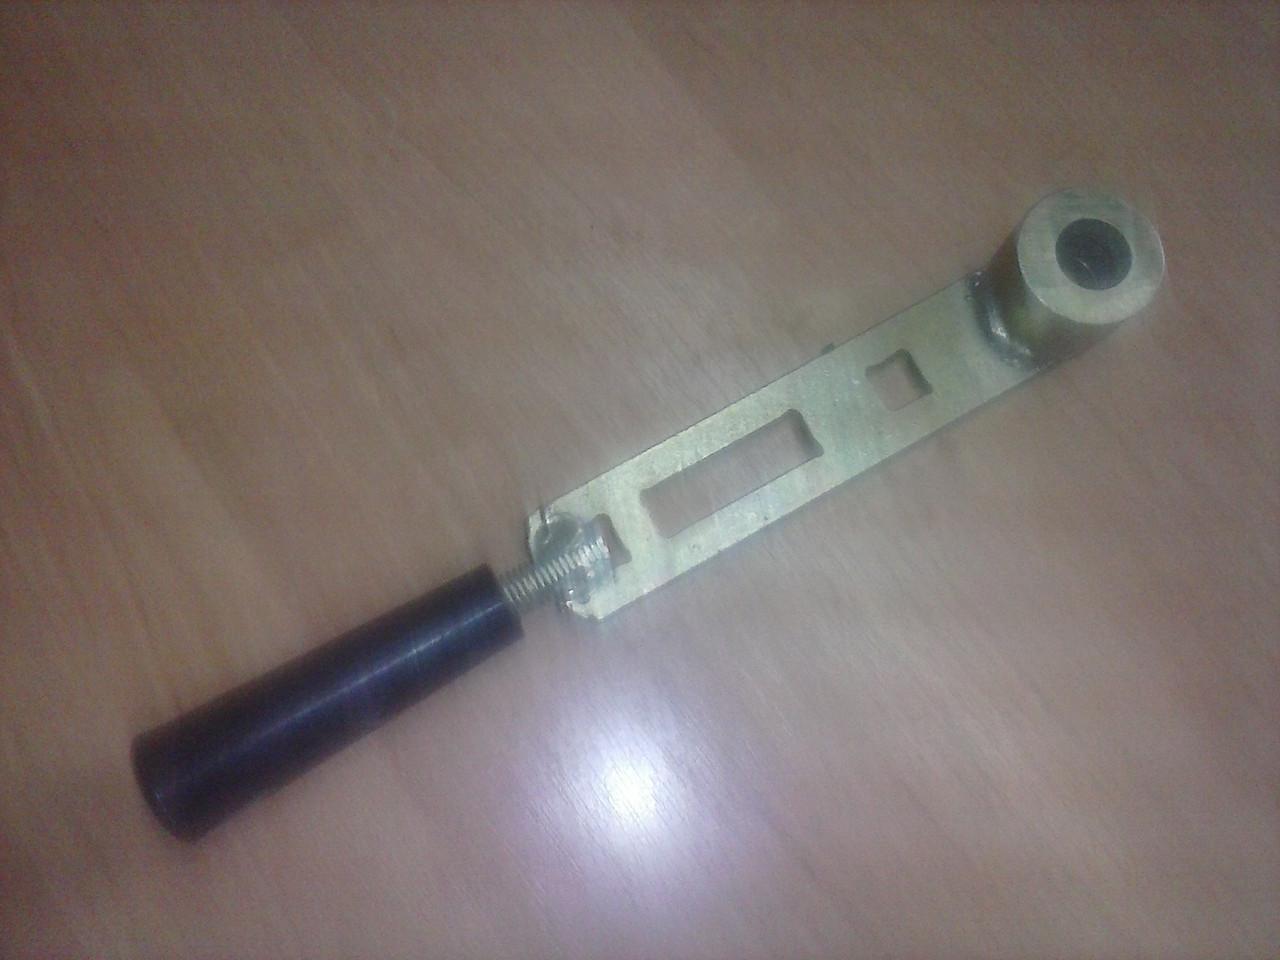 Рычаг СЗГ 00.1440 (ручка высев.аппарата мал.)   на сеялку зерновую СЗ-3,6